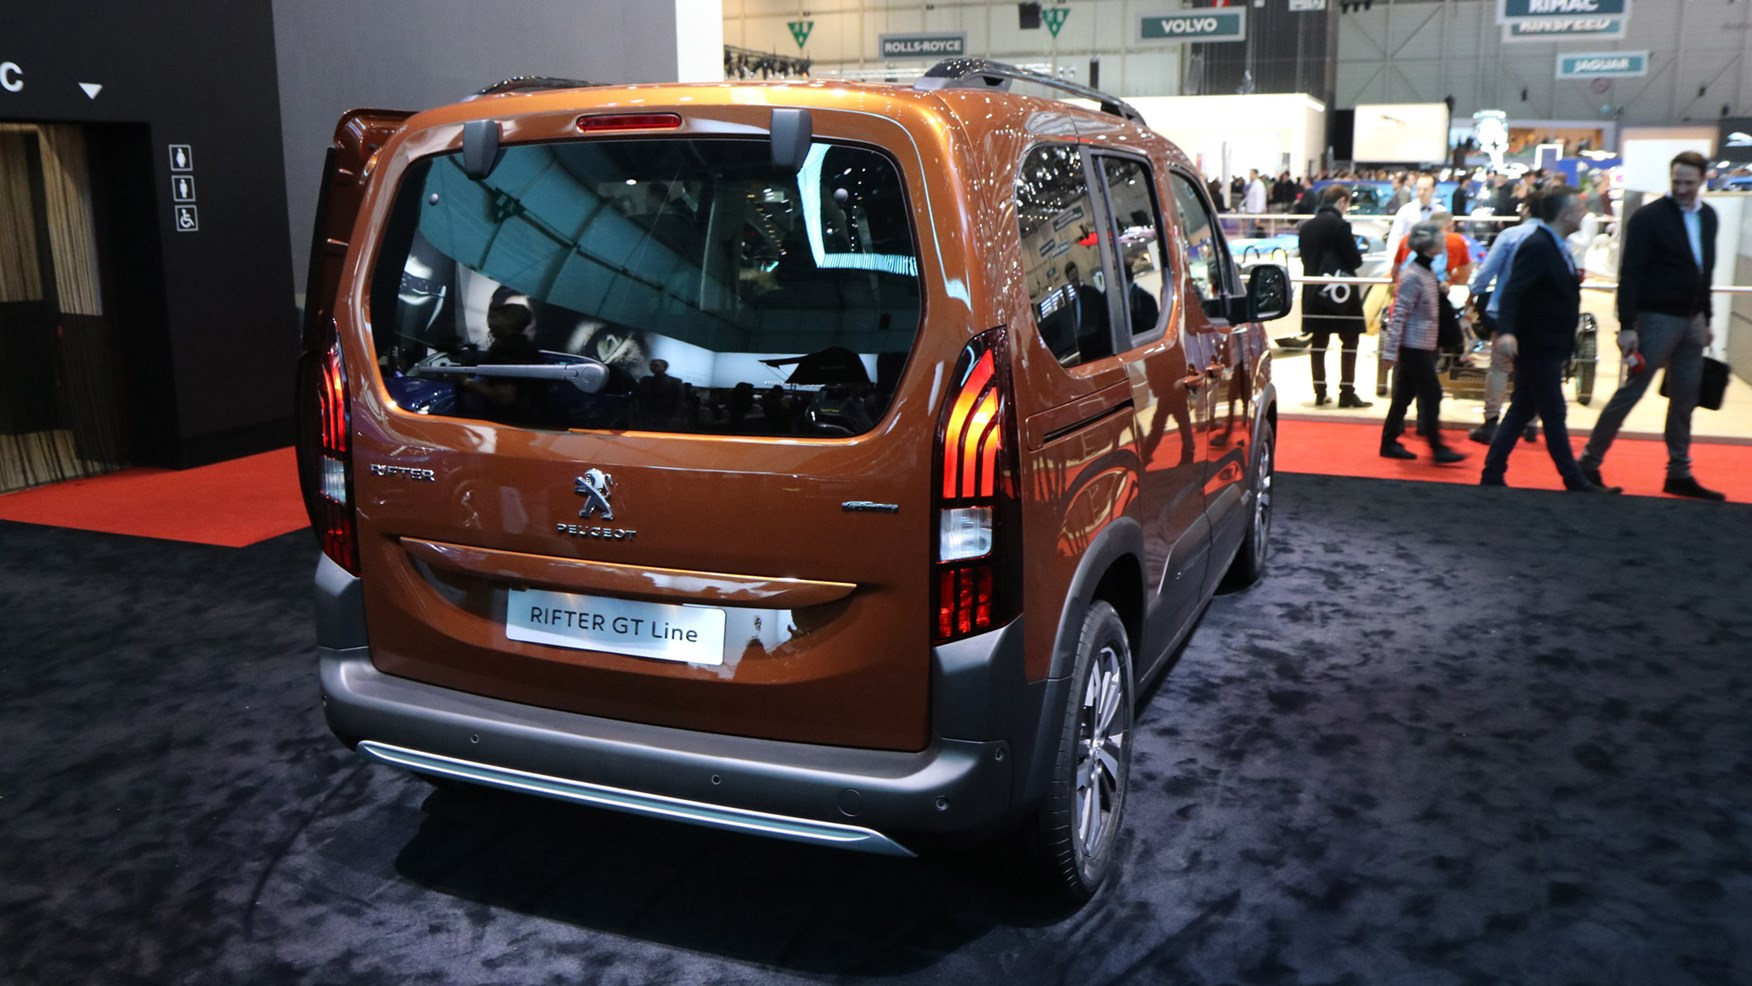 Peugeot Rifter Uk Price Of Mpv Revealed Car Magazine